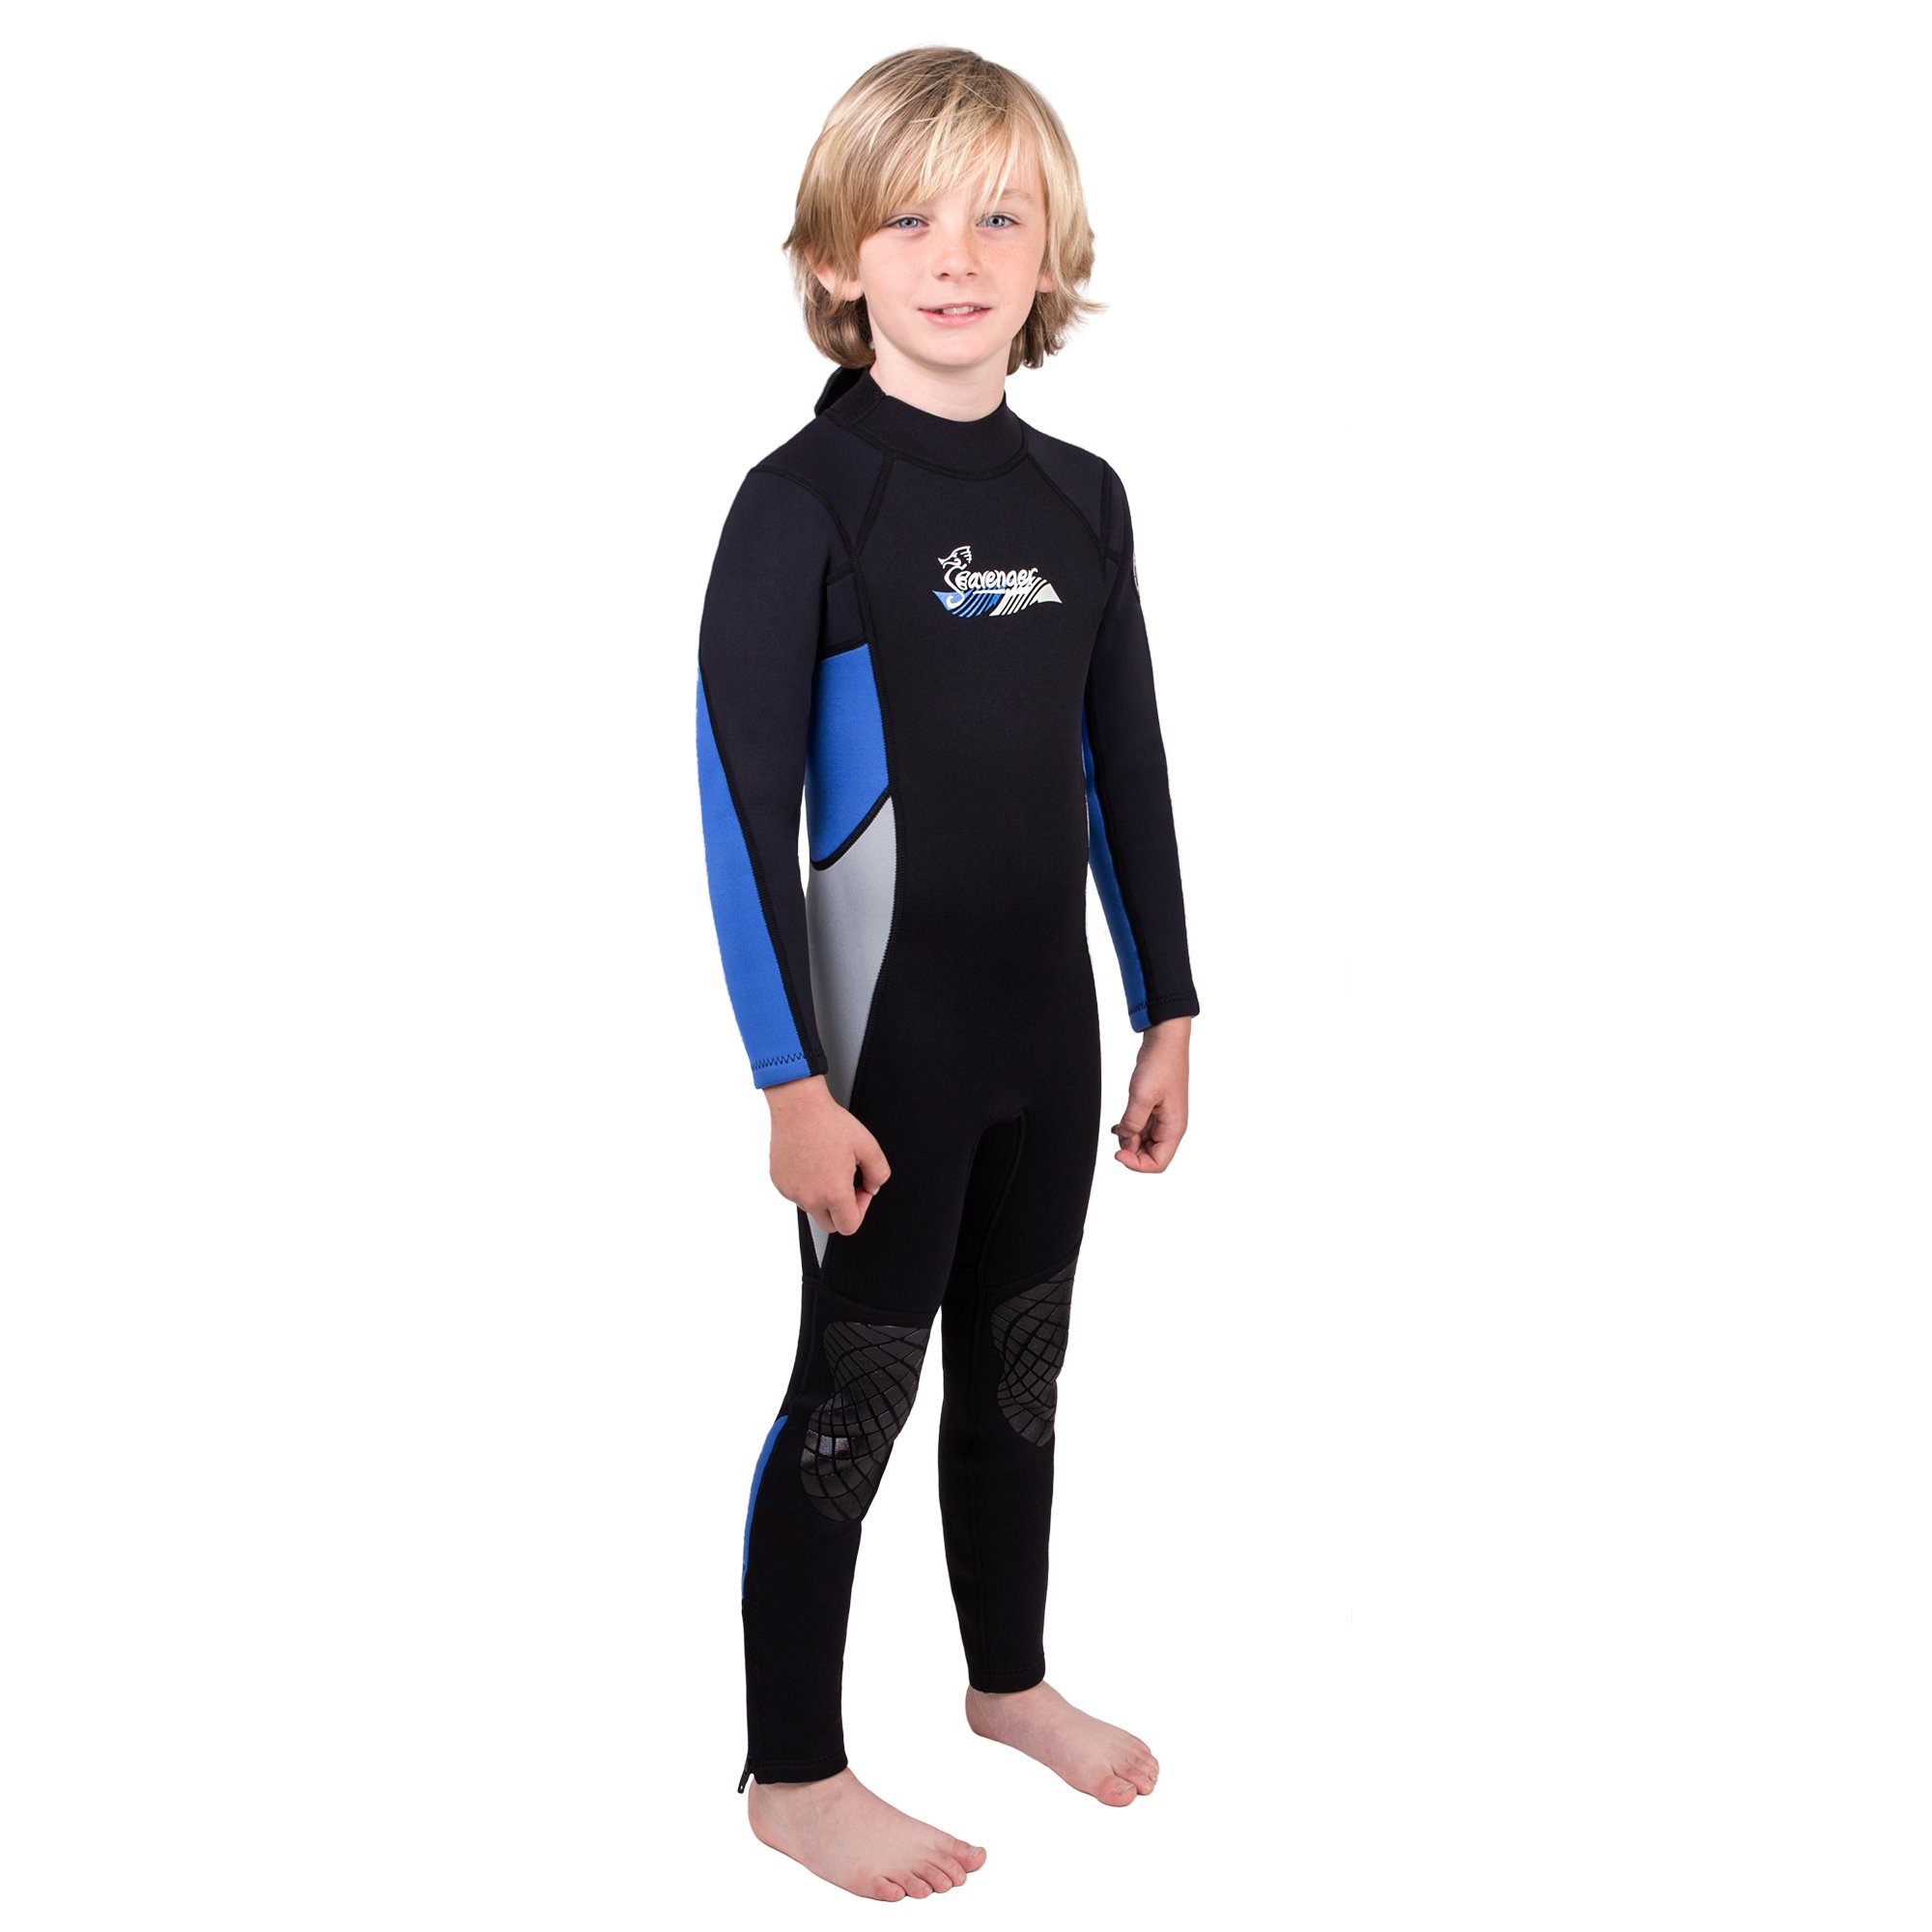 Seavenger Scout 3mm Kids Wetsuit | Full Body Neoprene Suit for Snorkeling, Swimming, Diving (Fire Red, 8) by Seavenger (Image #5)